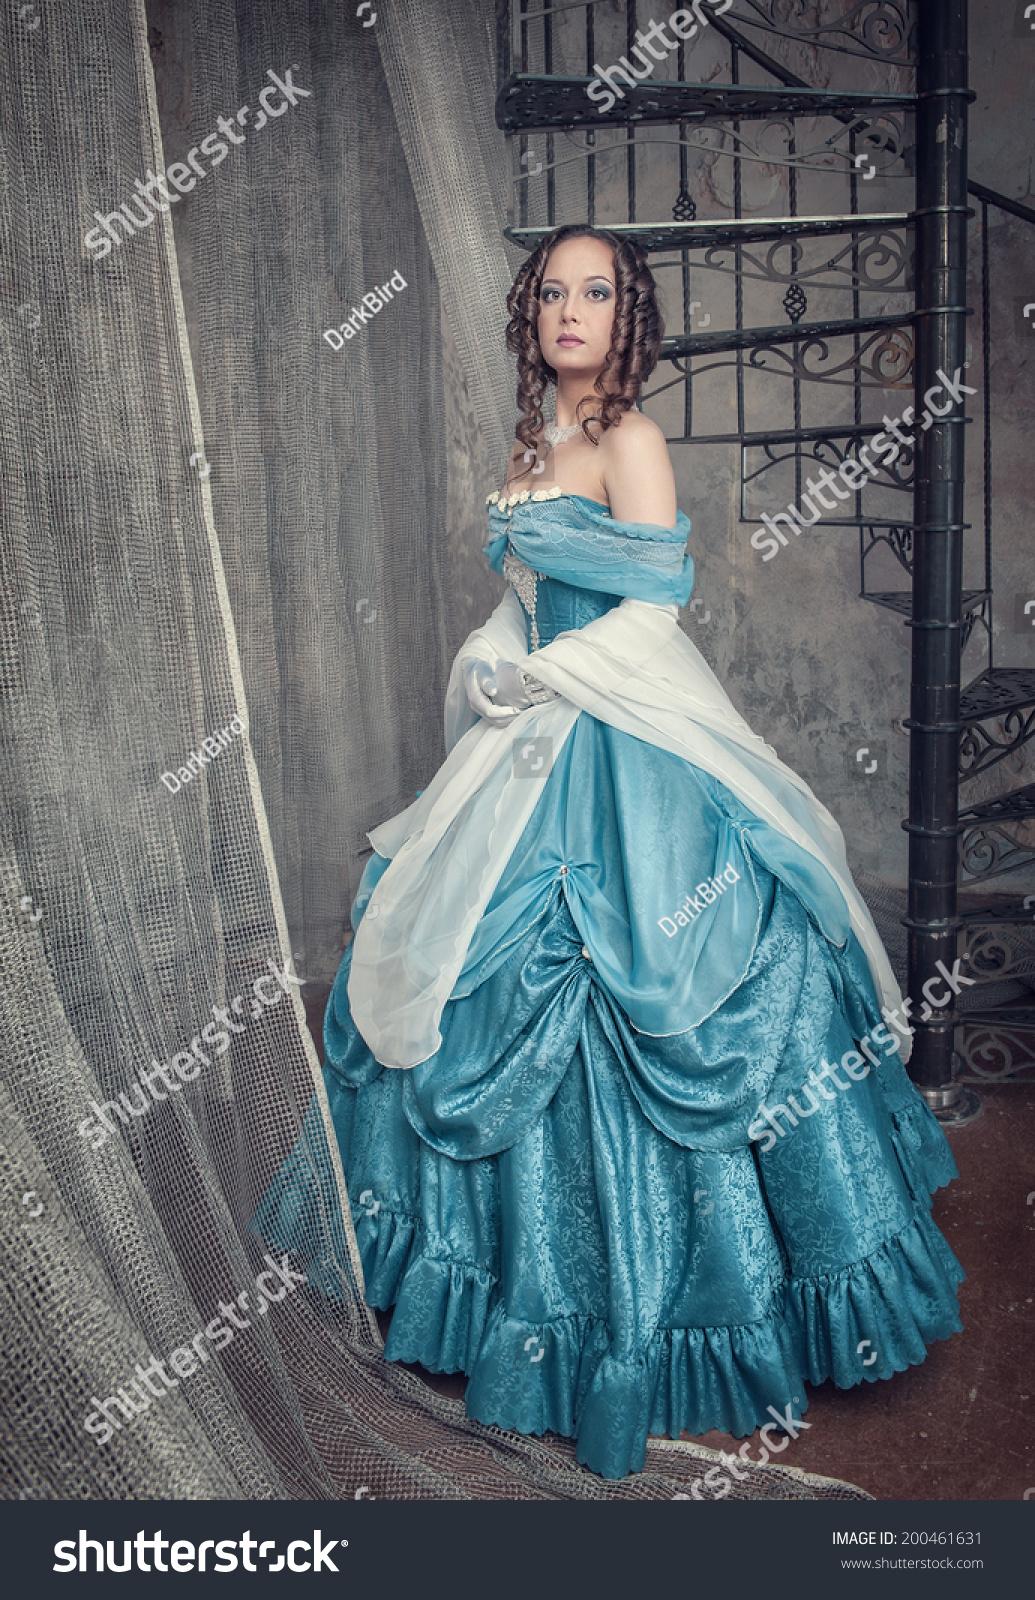 Beautiful Woman Blue Medieval Dress Near Stock Photo (Edit Now ...